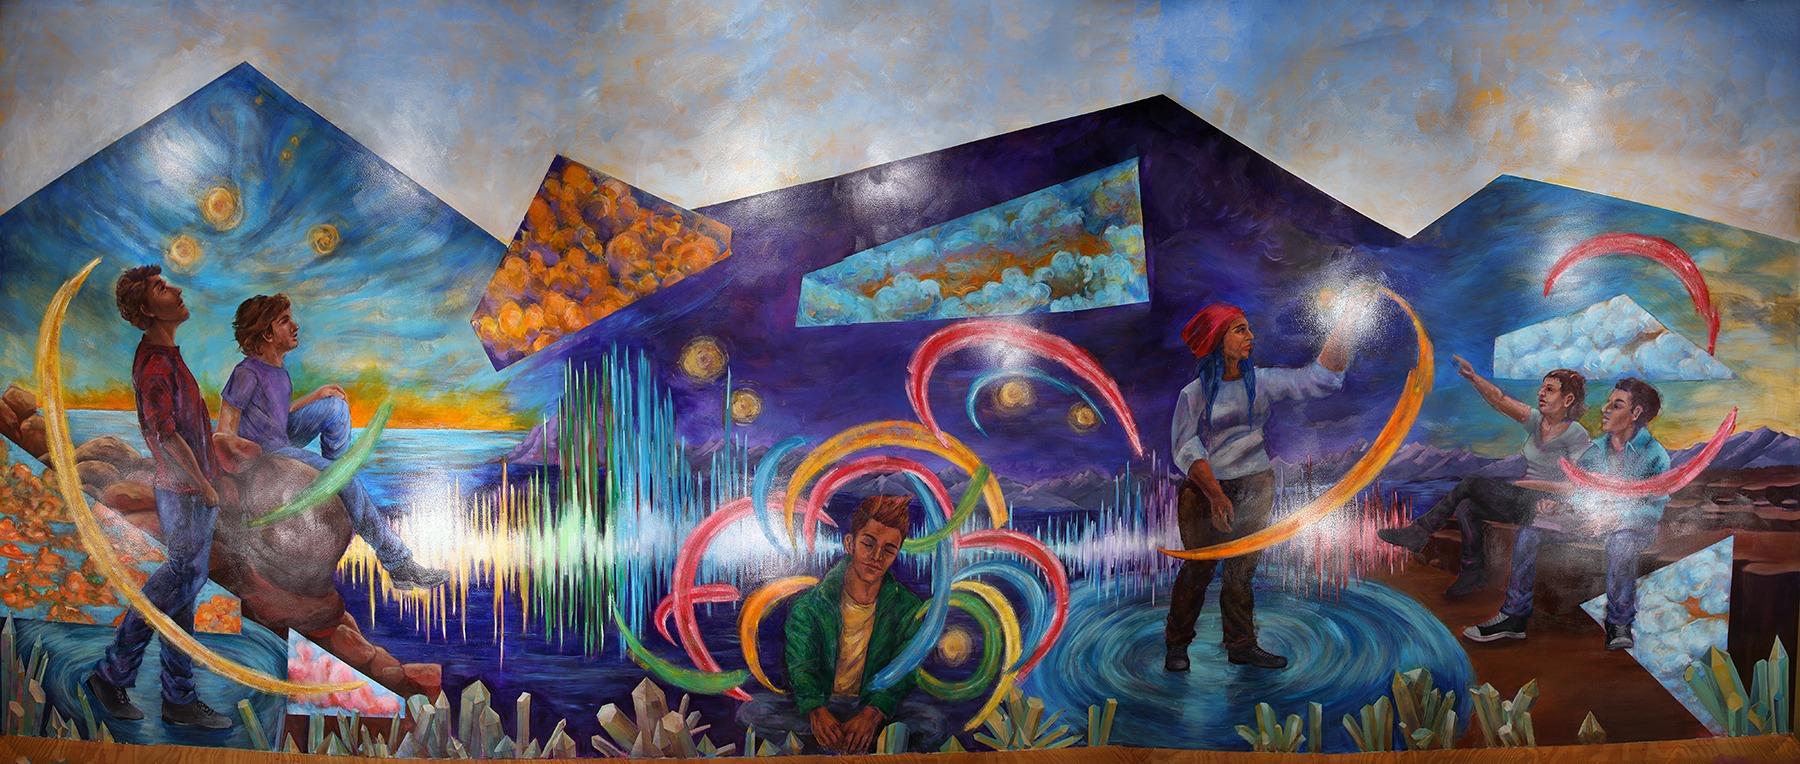 Stars Shine Brightest in the Dark mural